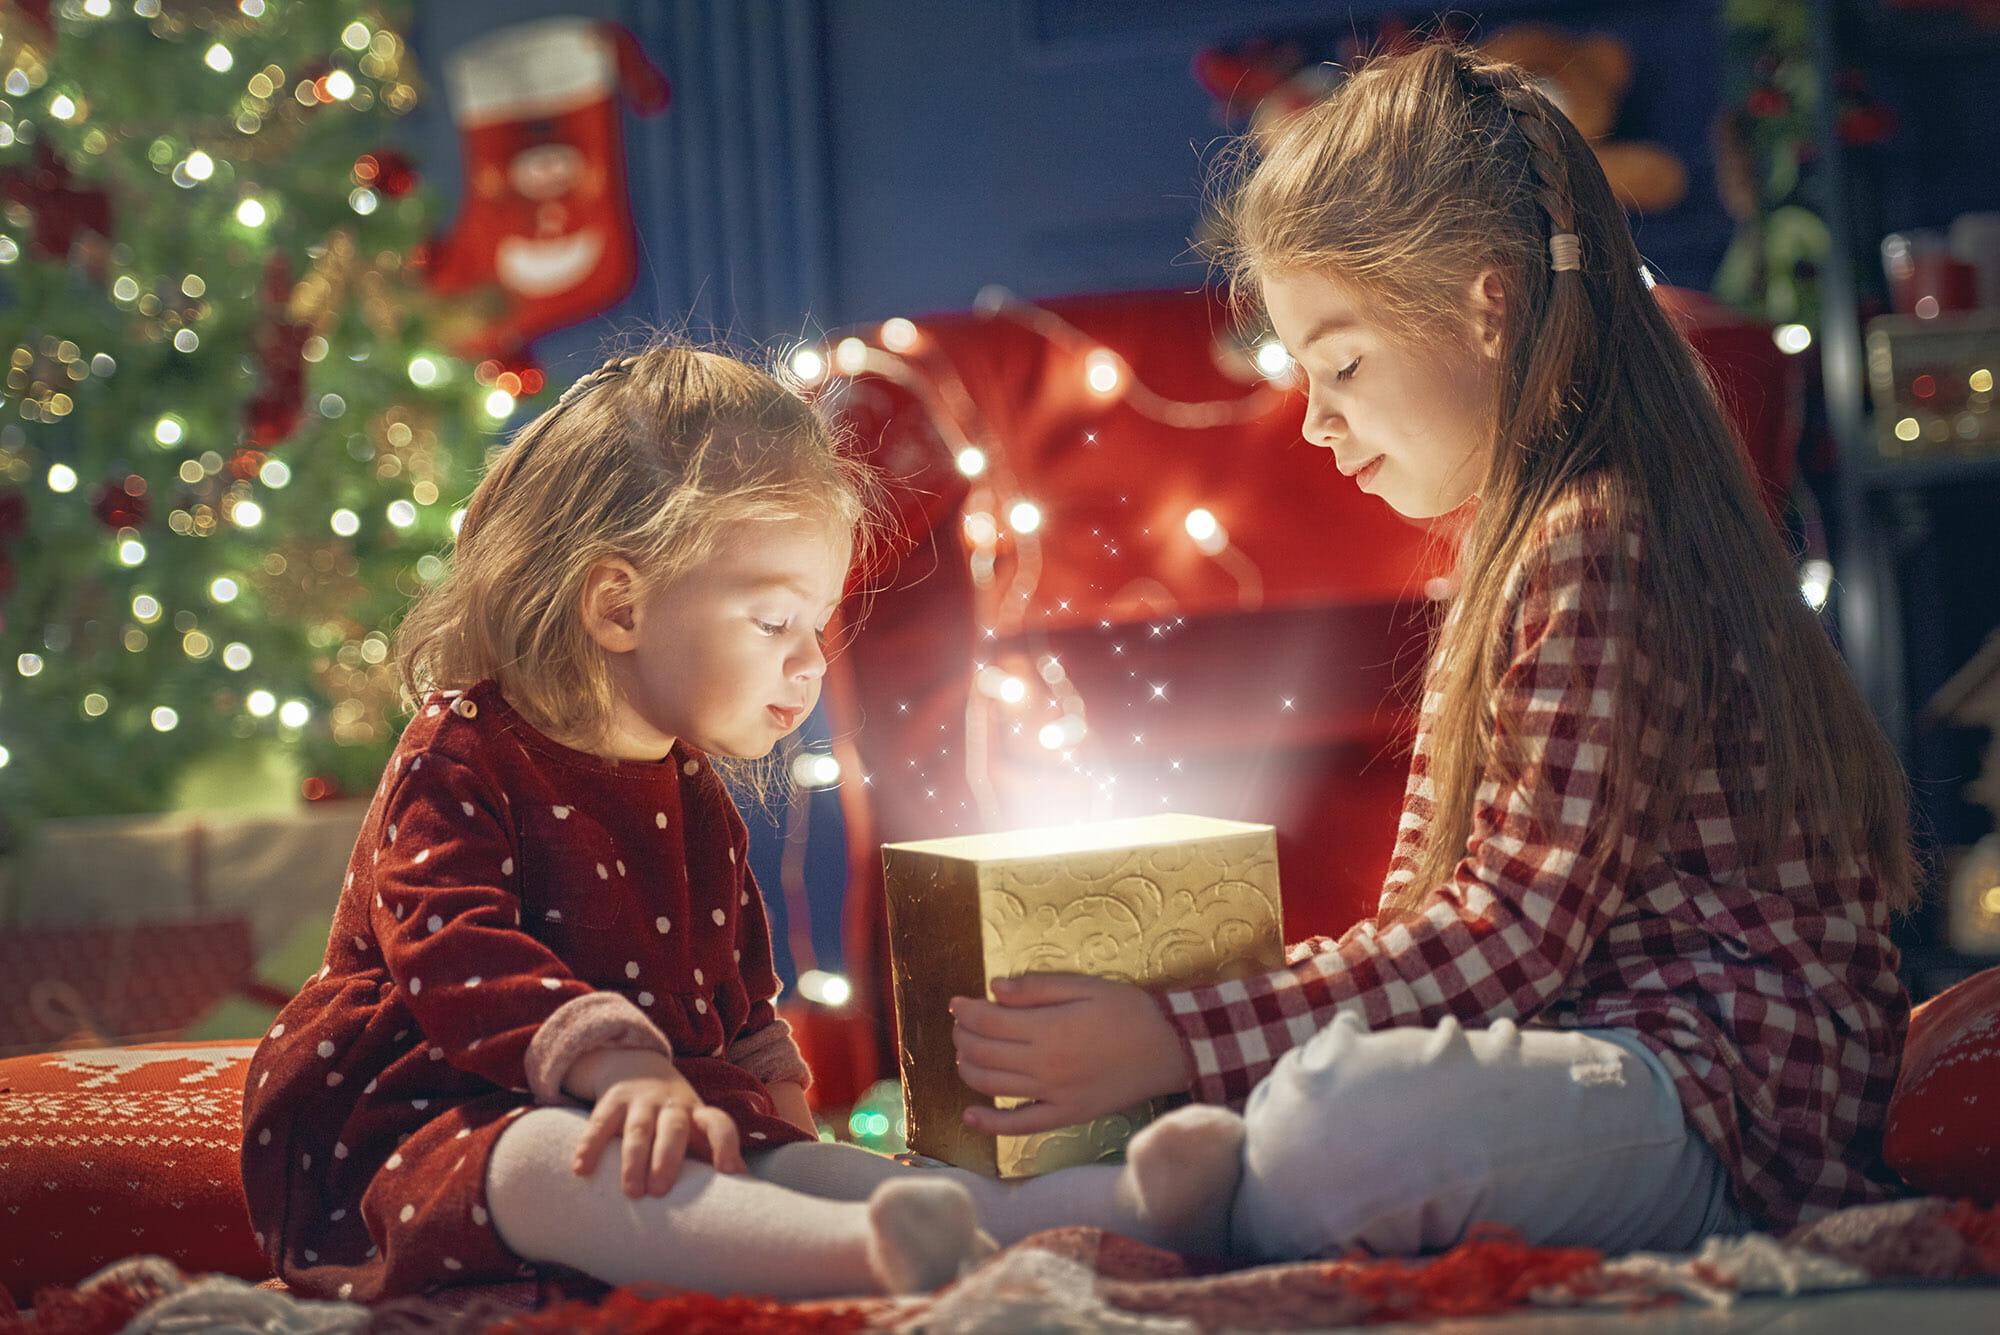 christmas children present glowing box light trick photography